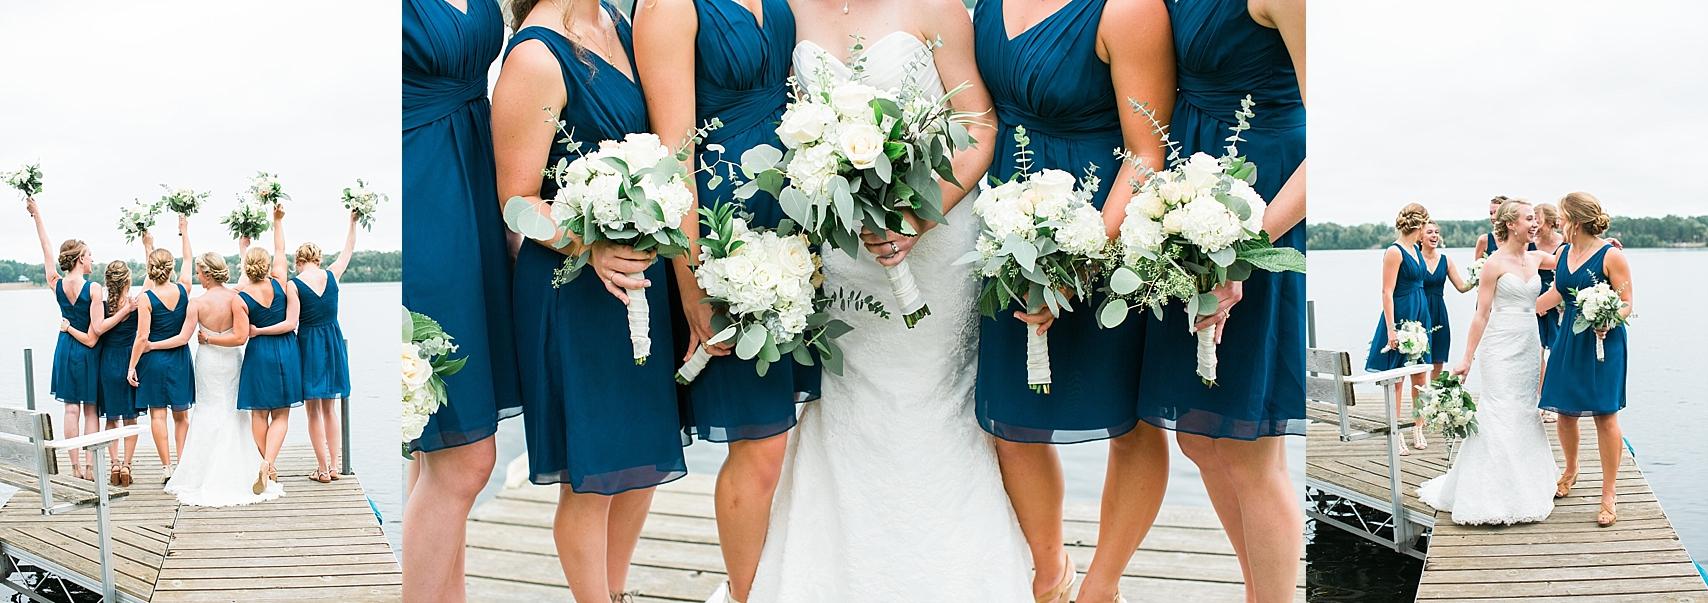 Minnesota Minneapolis Wedding Photographer Best Of 2018 Weddings Mallory Kiesow Photography_0036.jpg